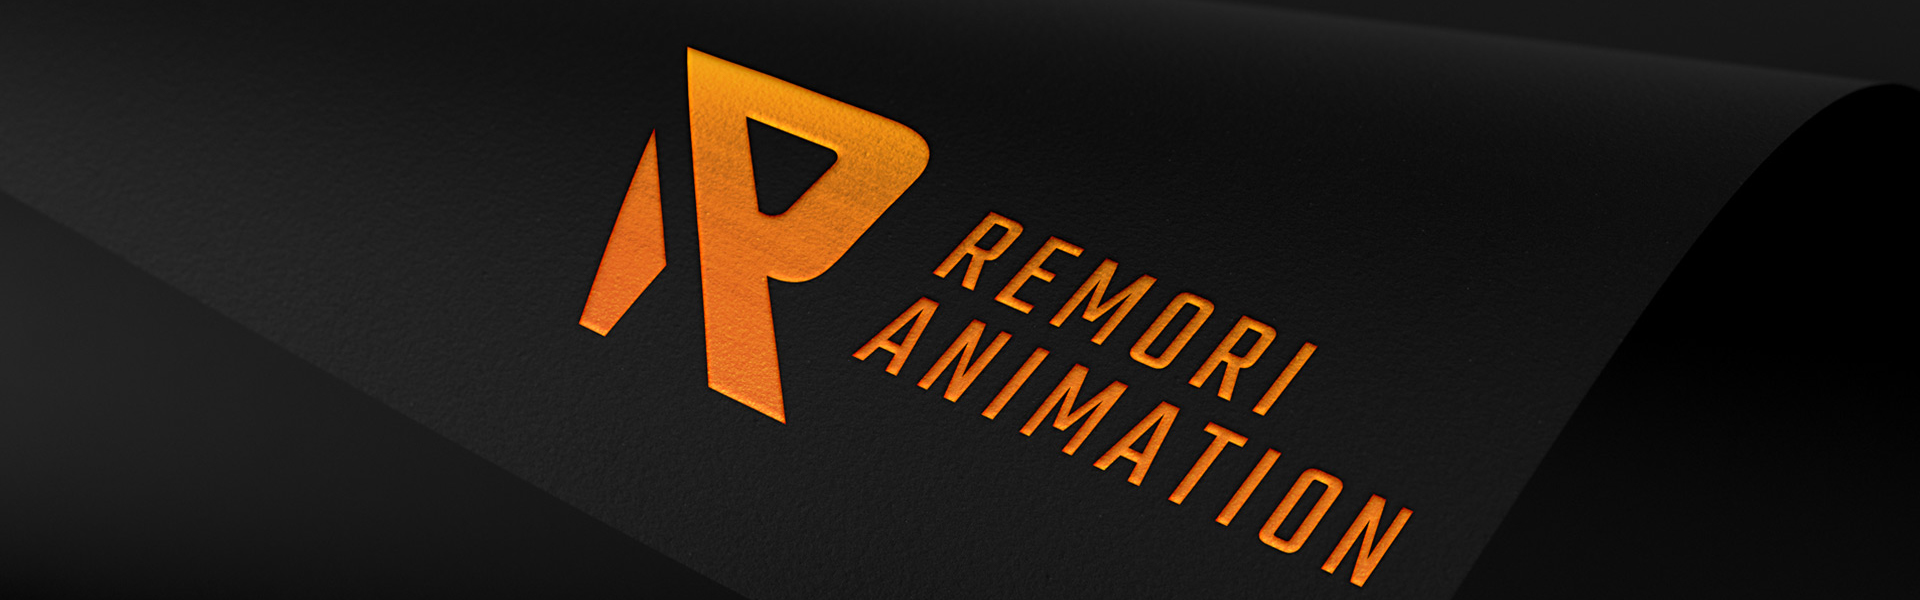 Remori animation mockup